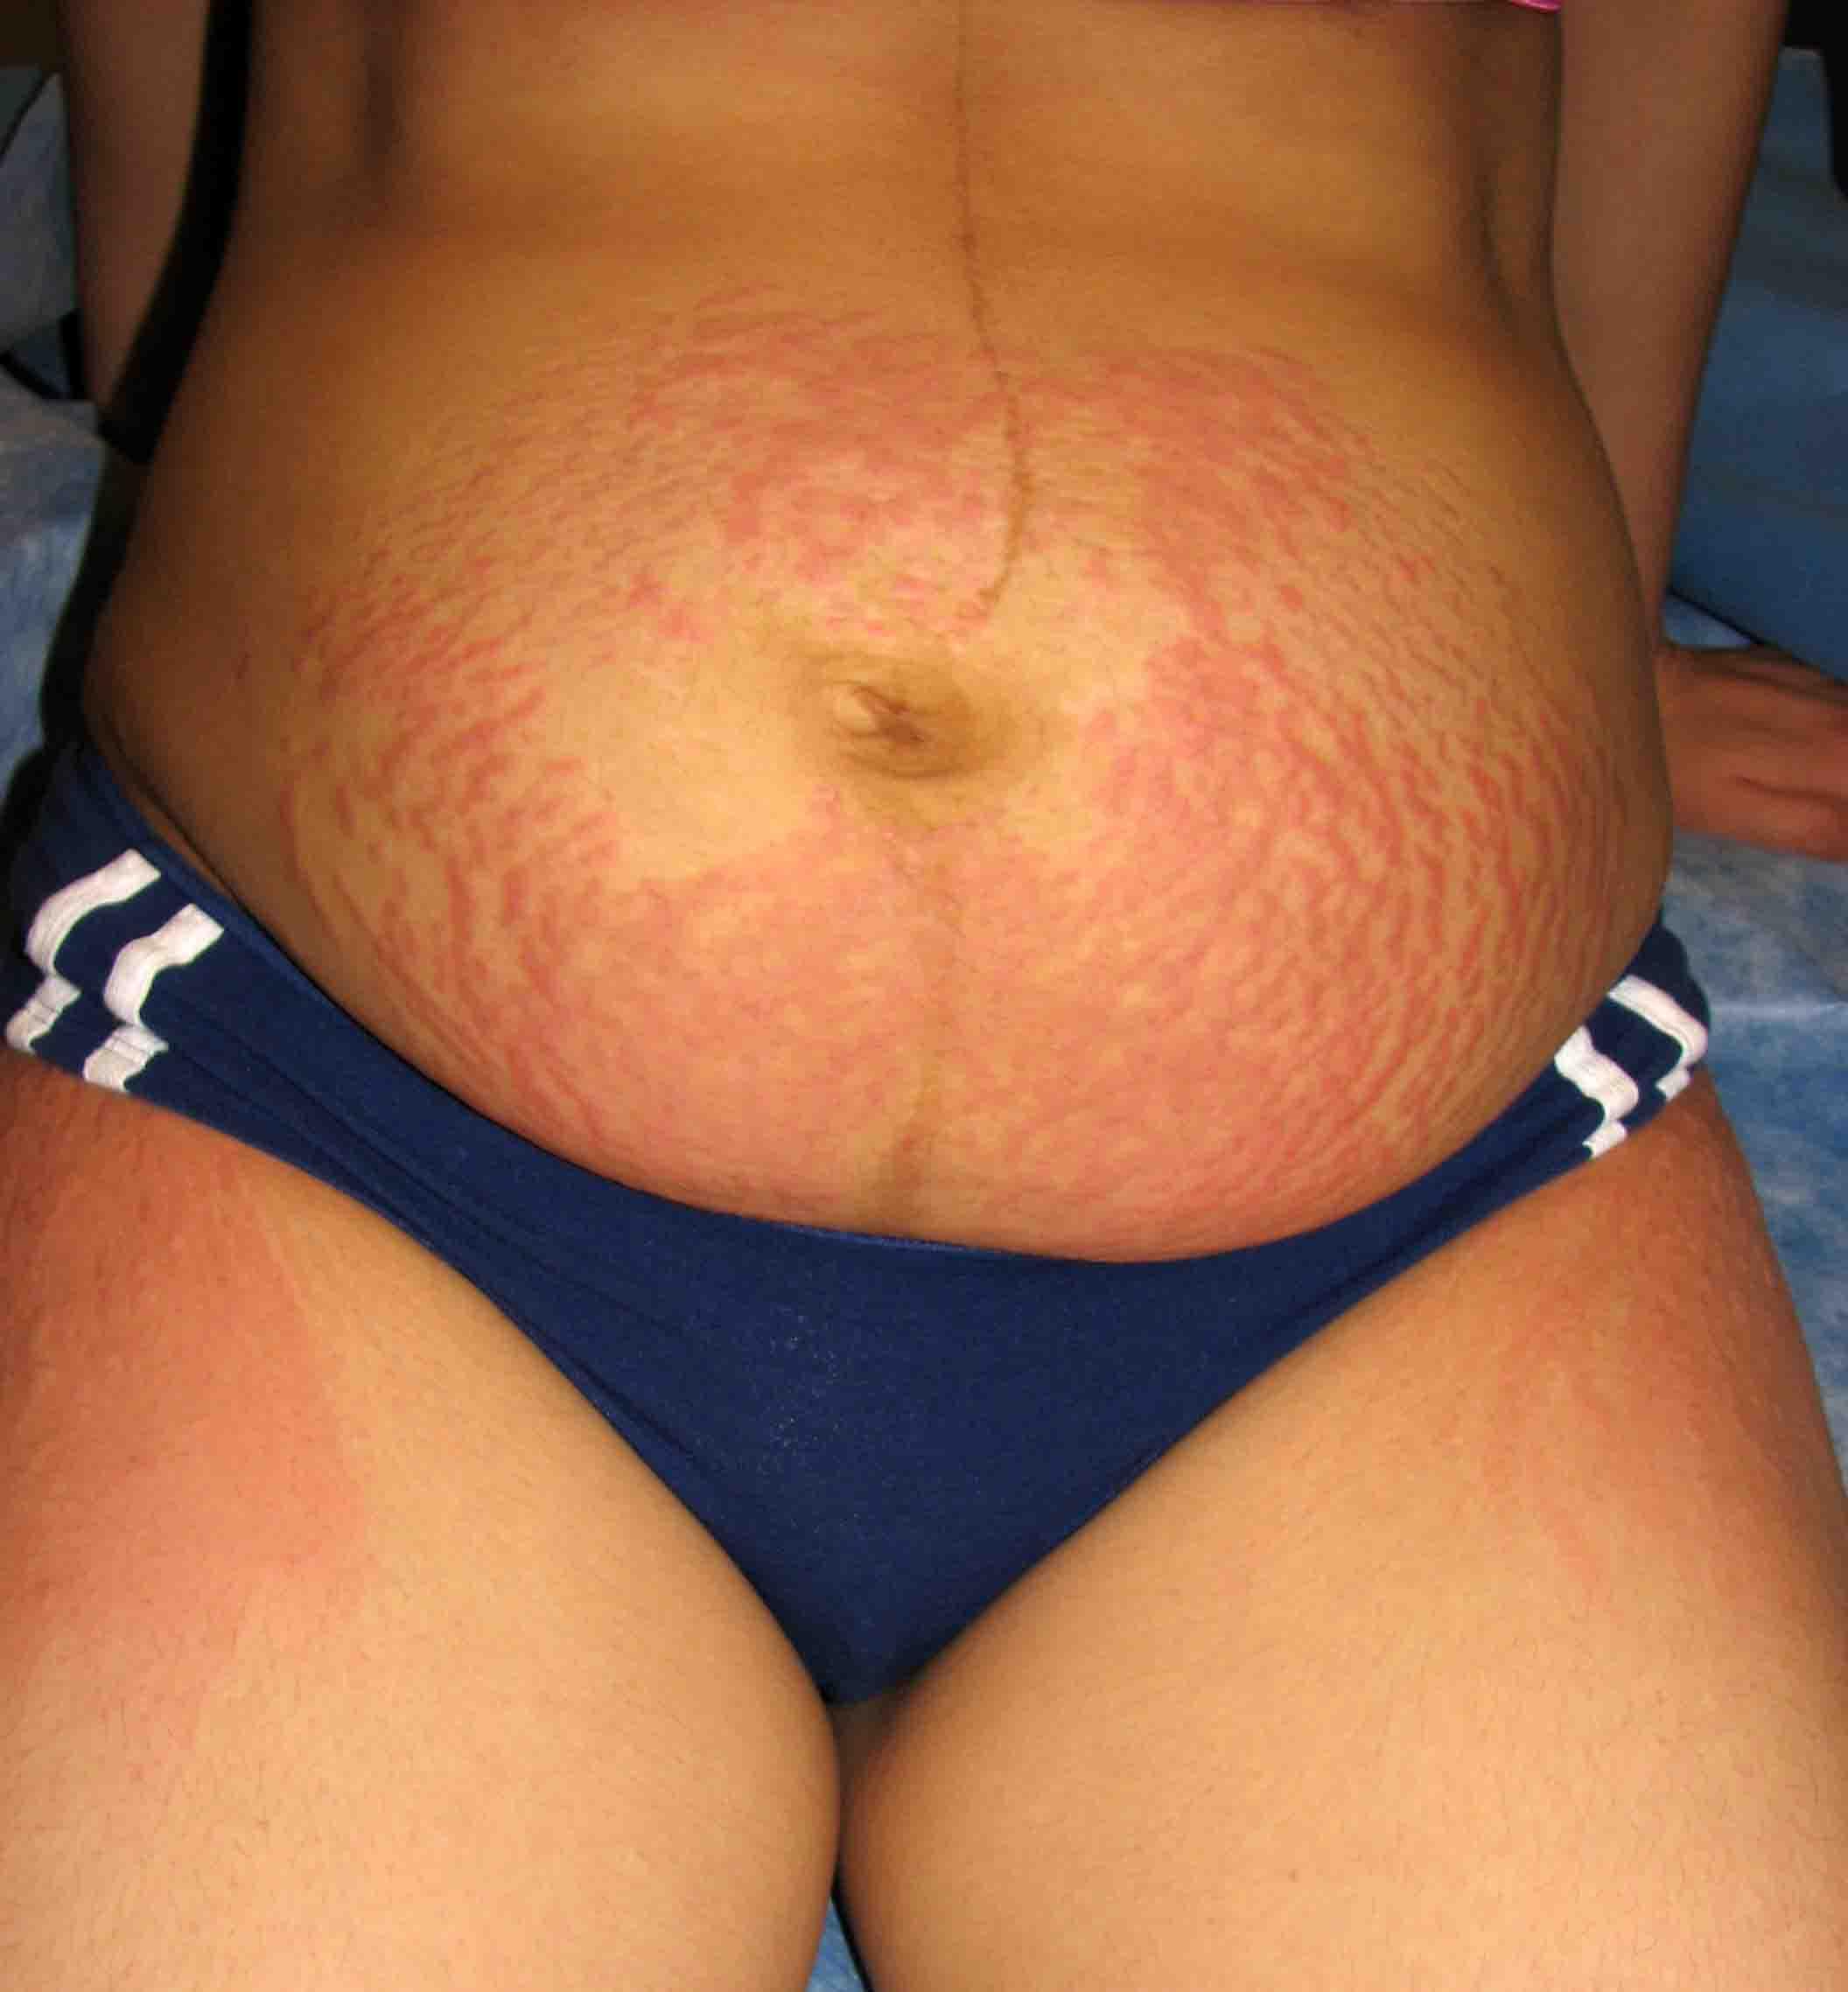 Pupps rash - Pictures, Symptoms, Causes, Treatment